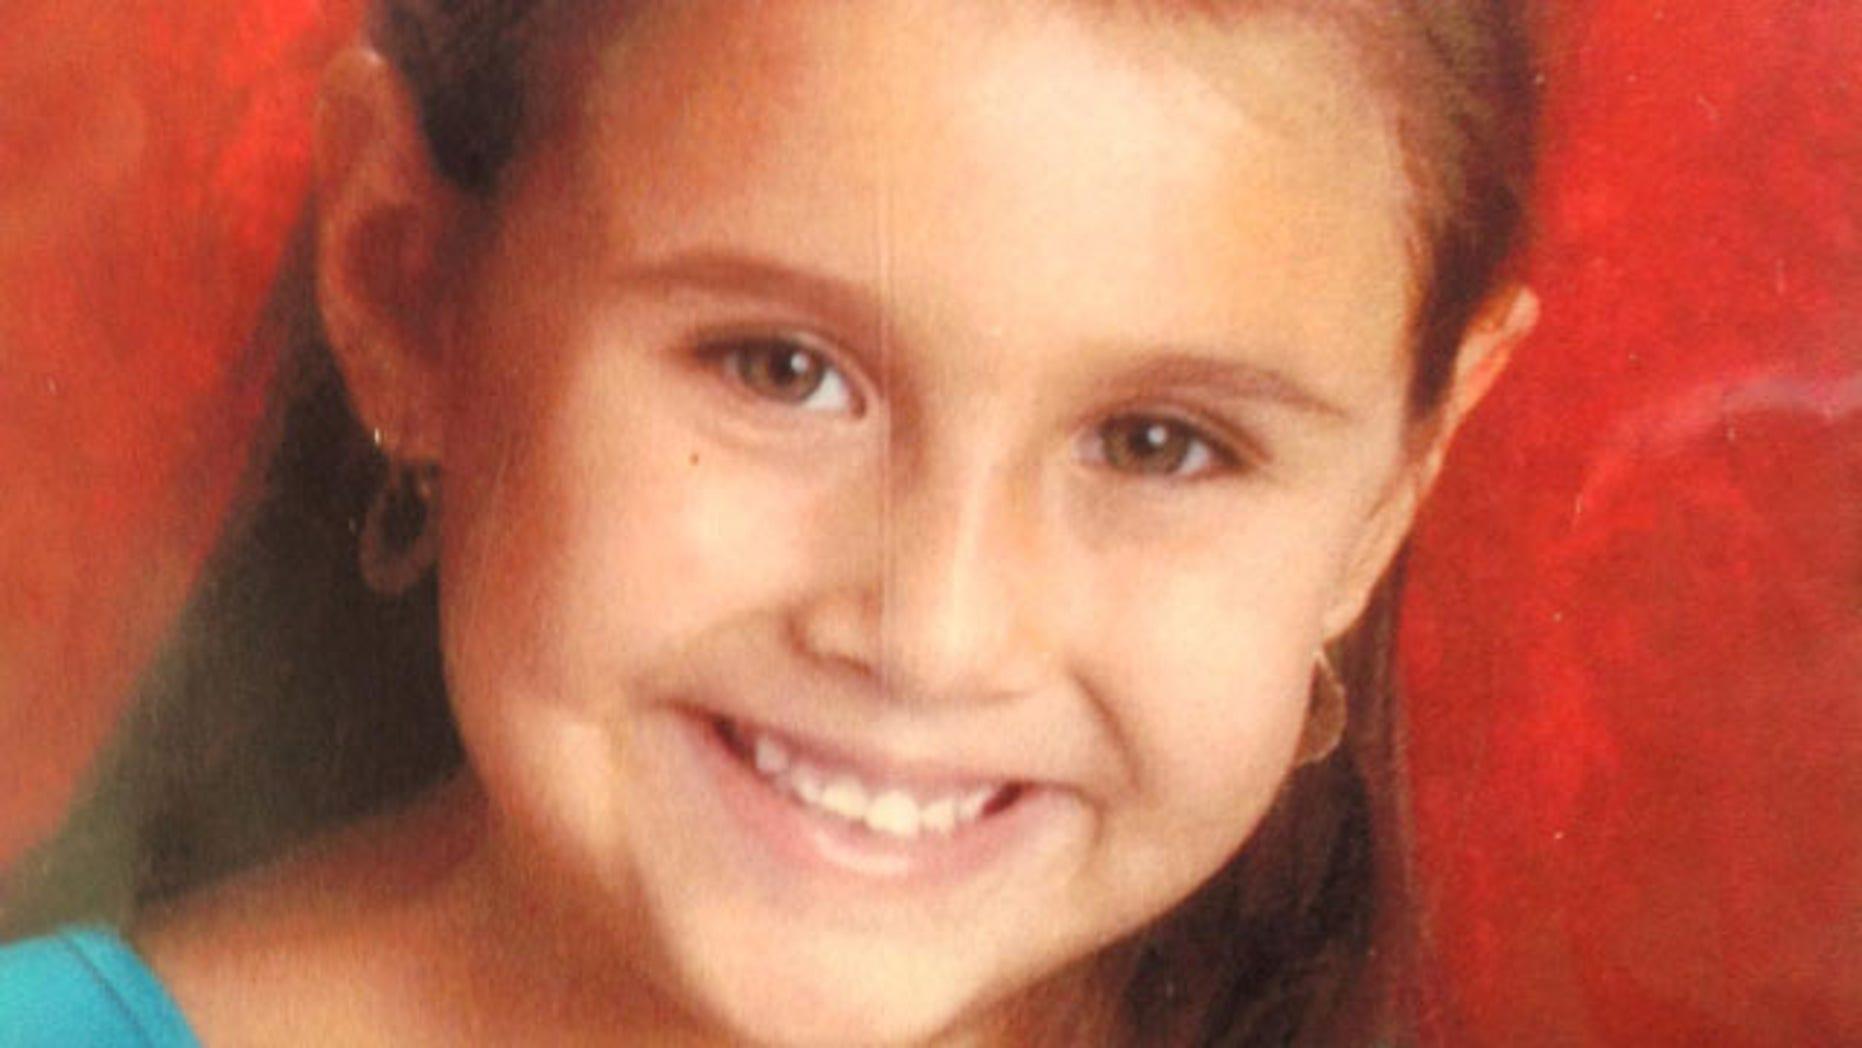 Missing six-year-old girl Isabel Celis.